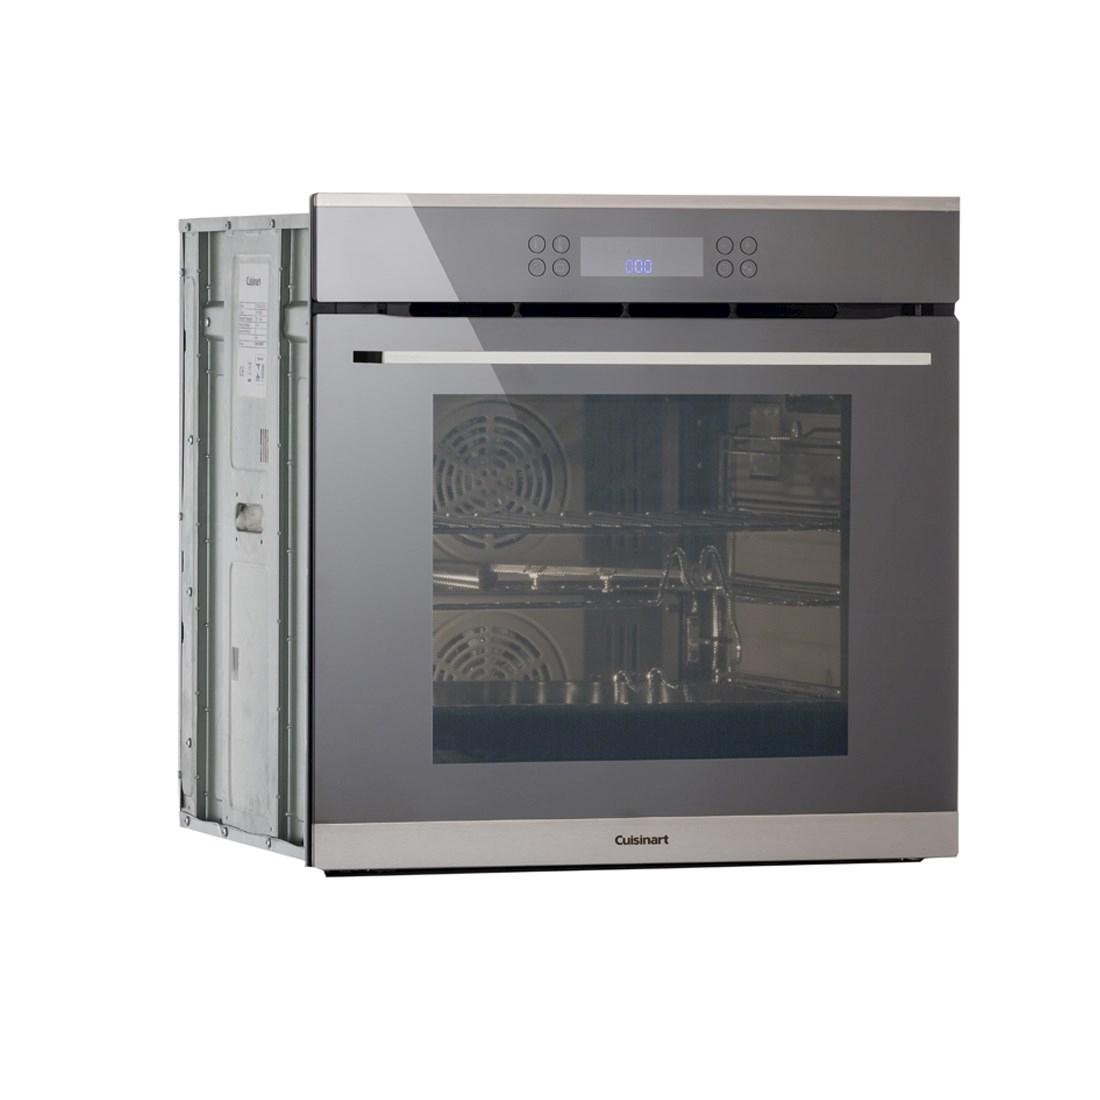 Forno Elétrico Multifunções Cuisinart Prime Cooking Dual Zone 83 Litros Inox 60cm 220V